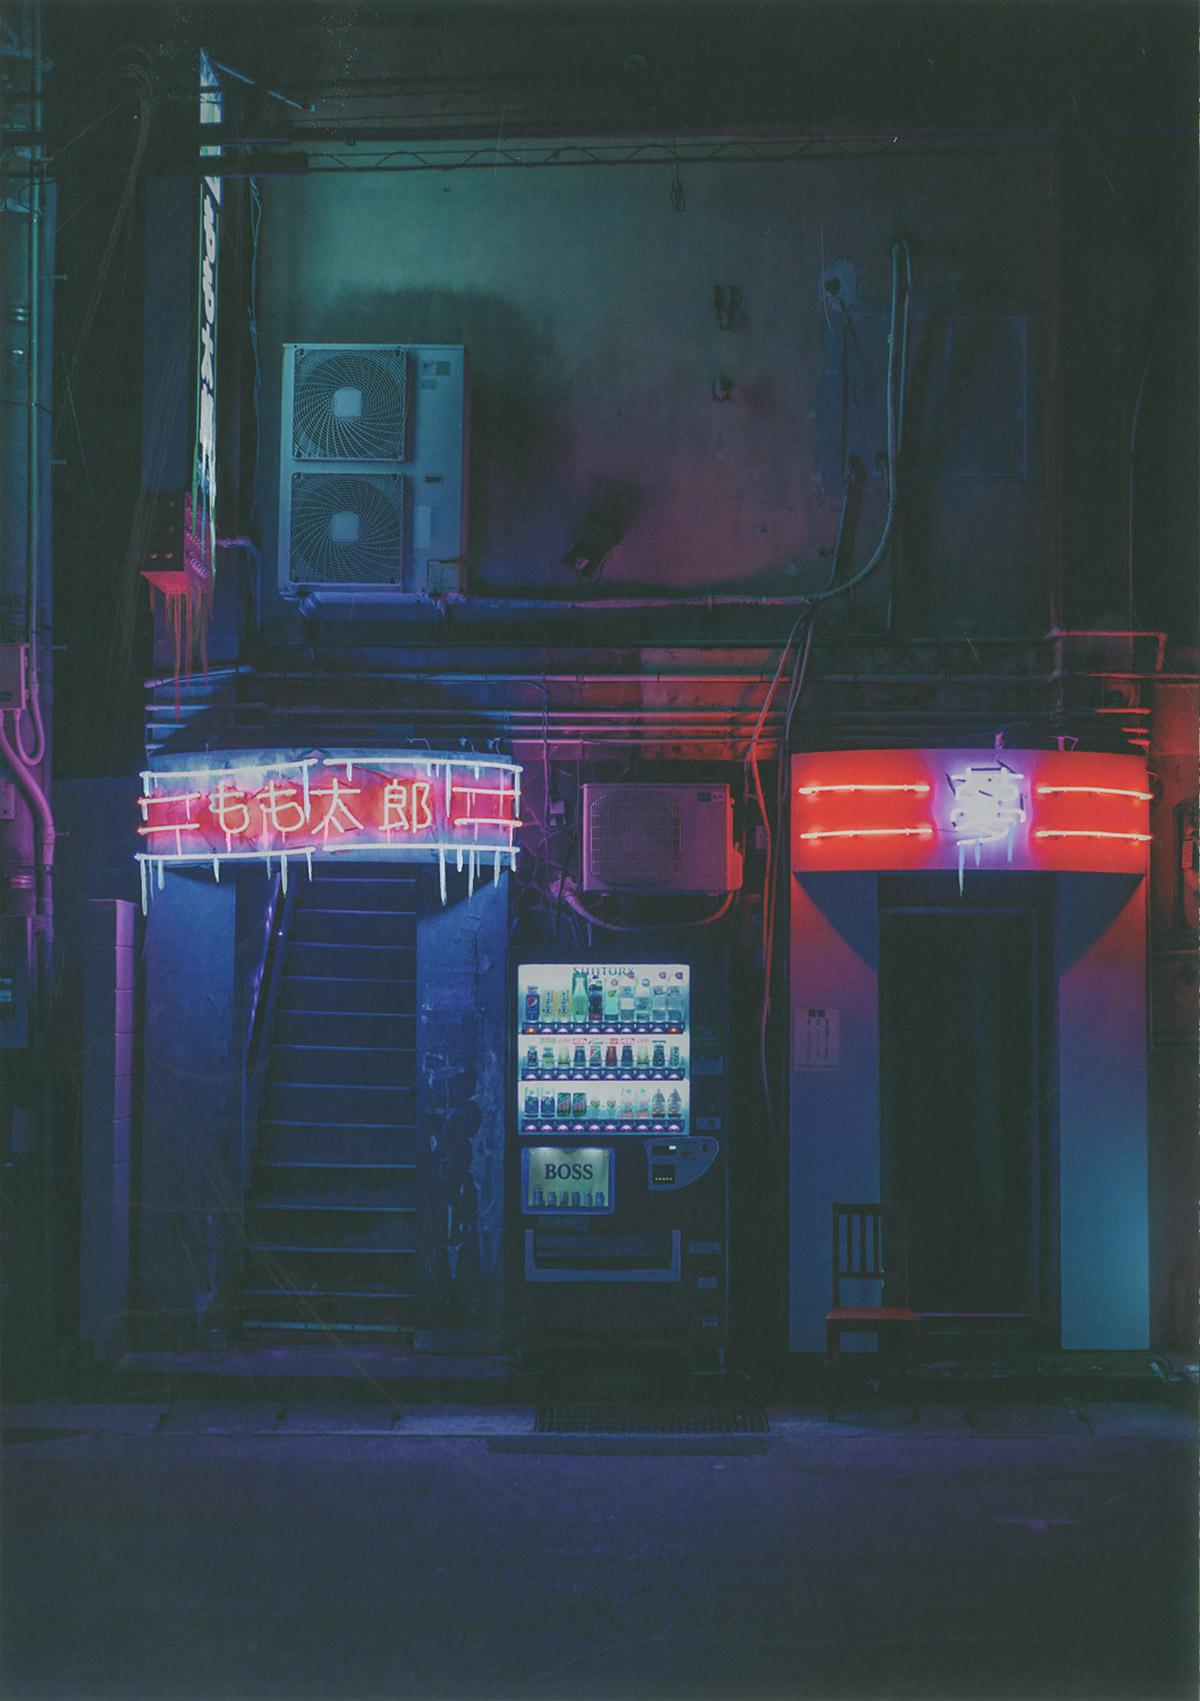 'Mono No Aware' by Gabriella Achadinha & Marlize Eckard